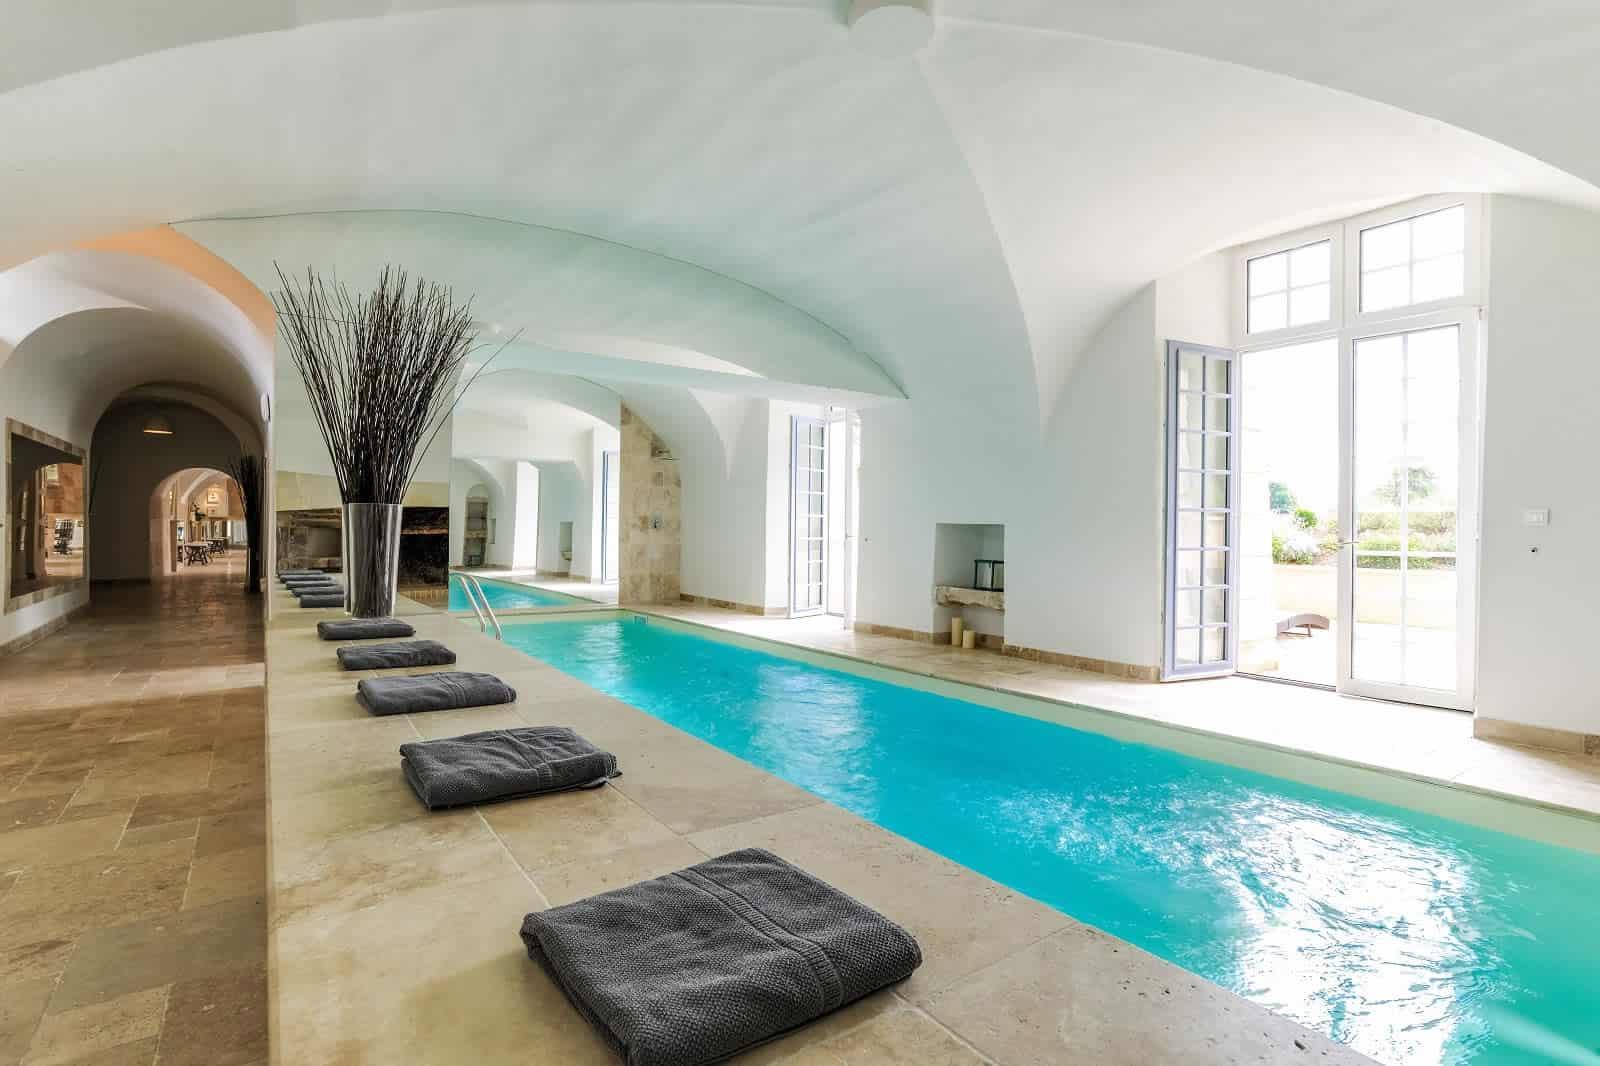 Greece Hotel Pool In Room